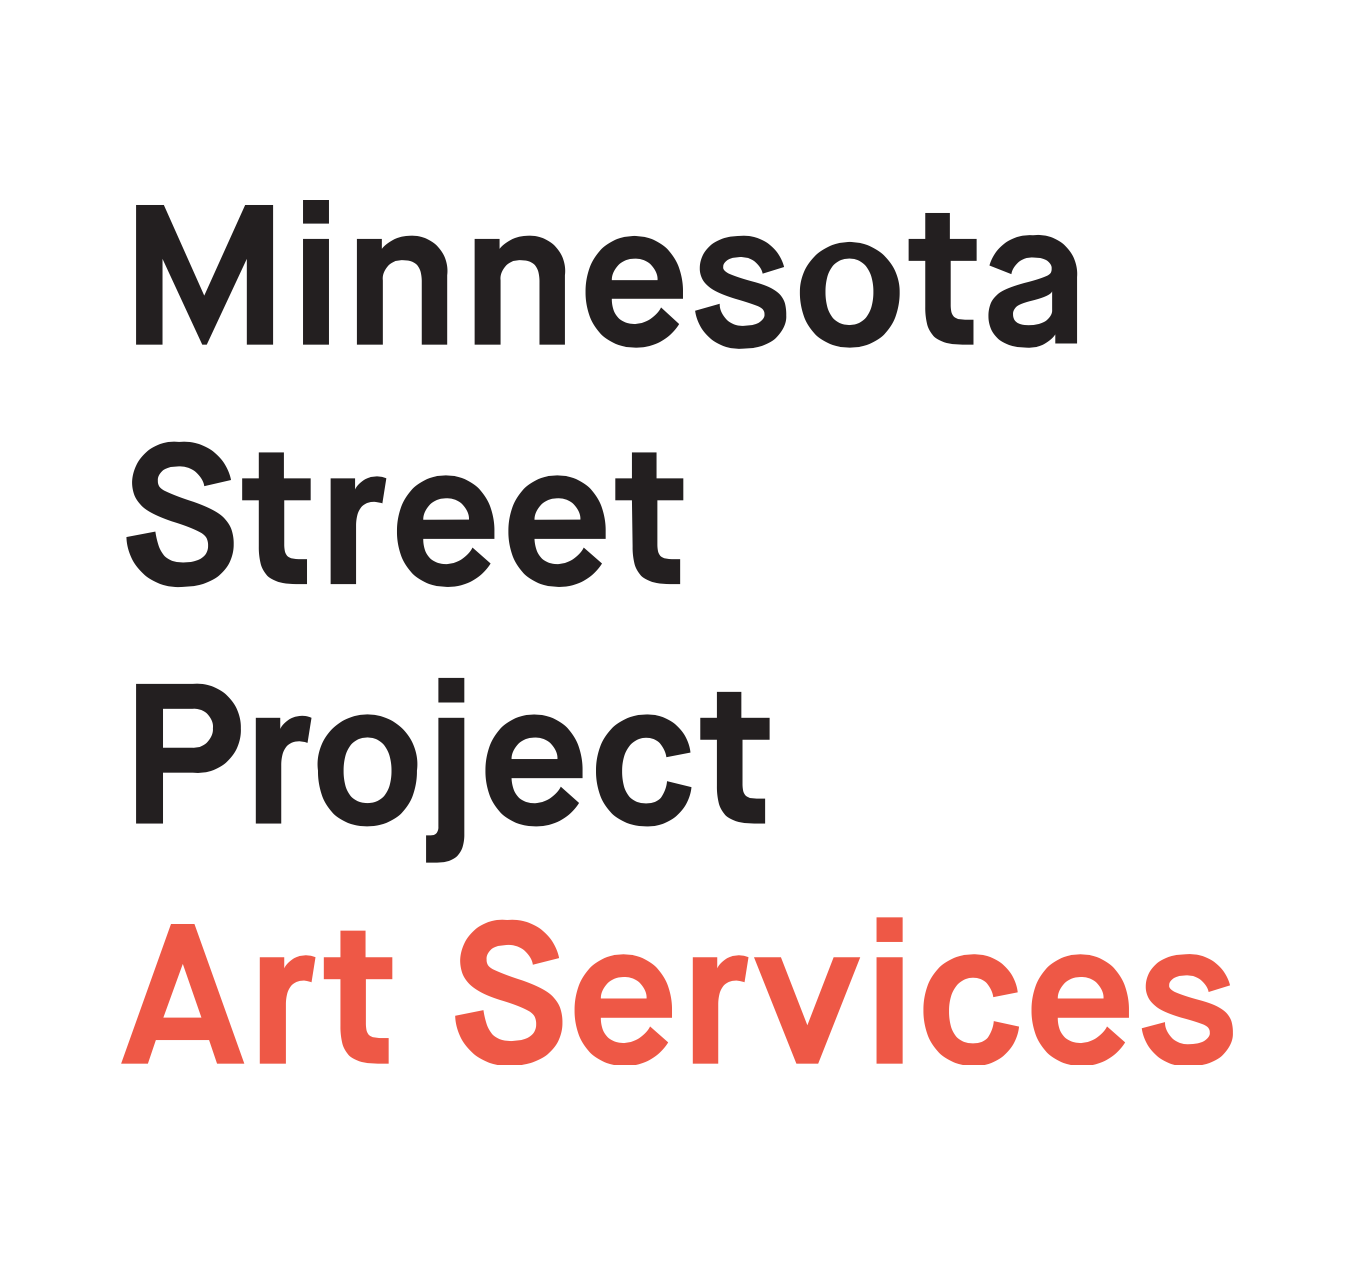 Minnesota Street Project Art Service logo